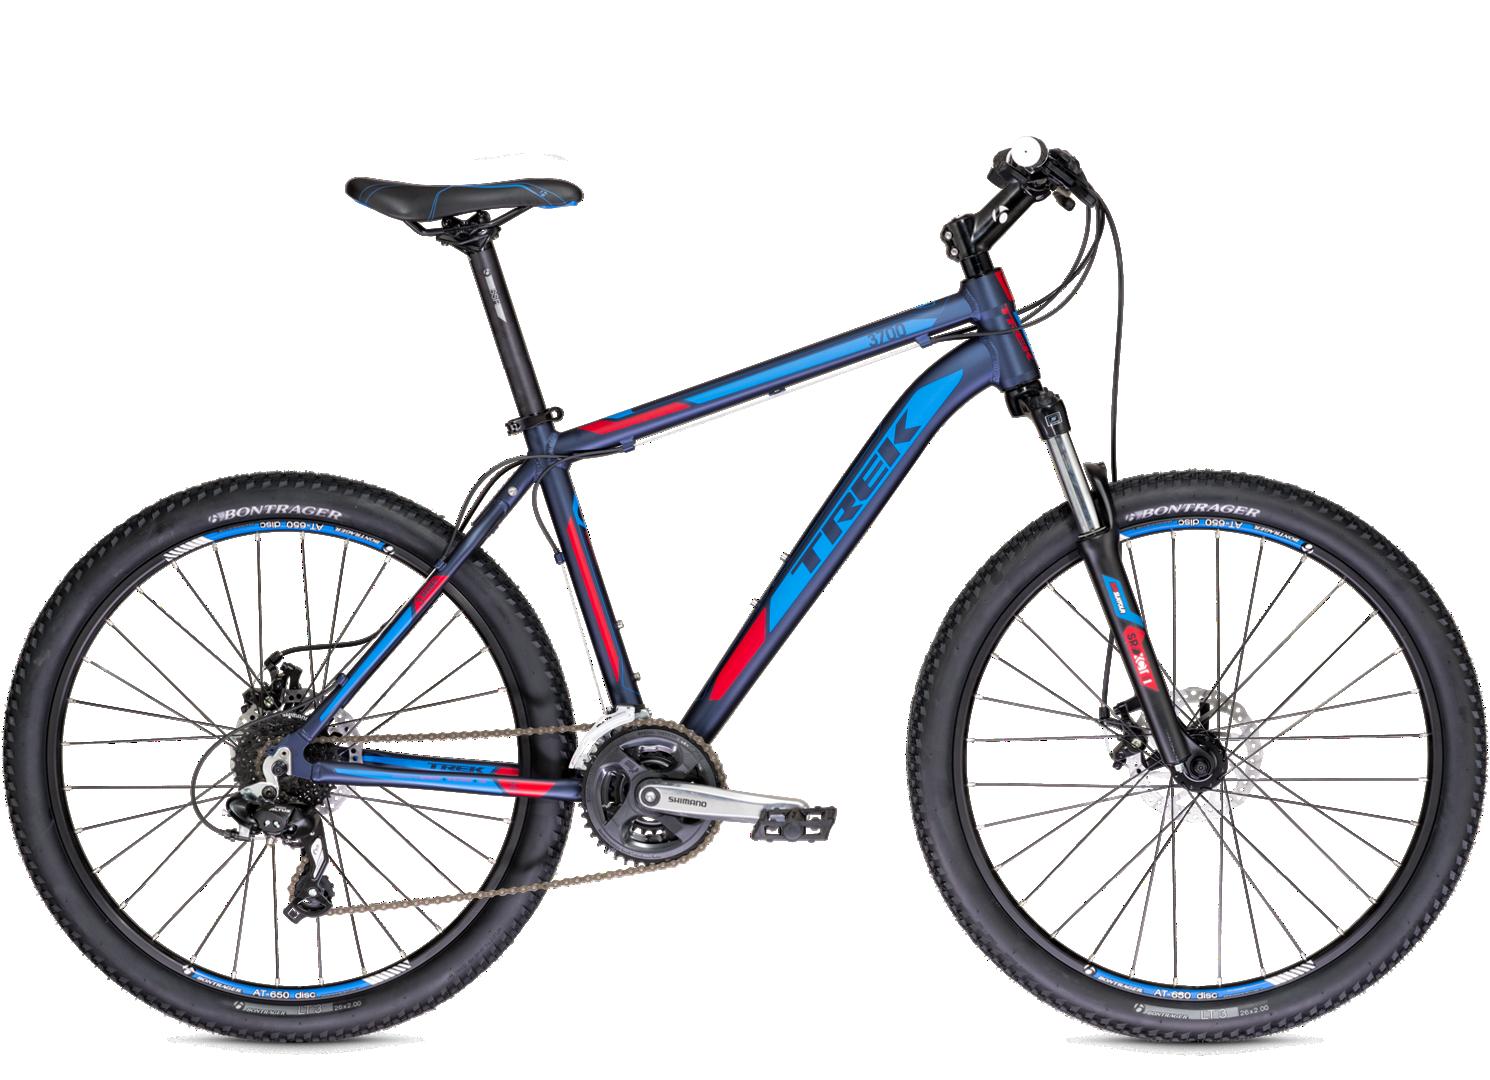 Bicicleta TREK 3700 2014